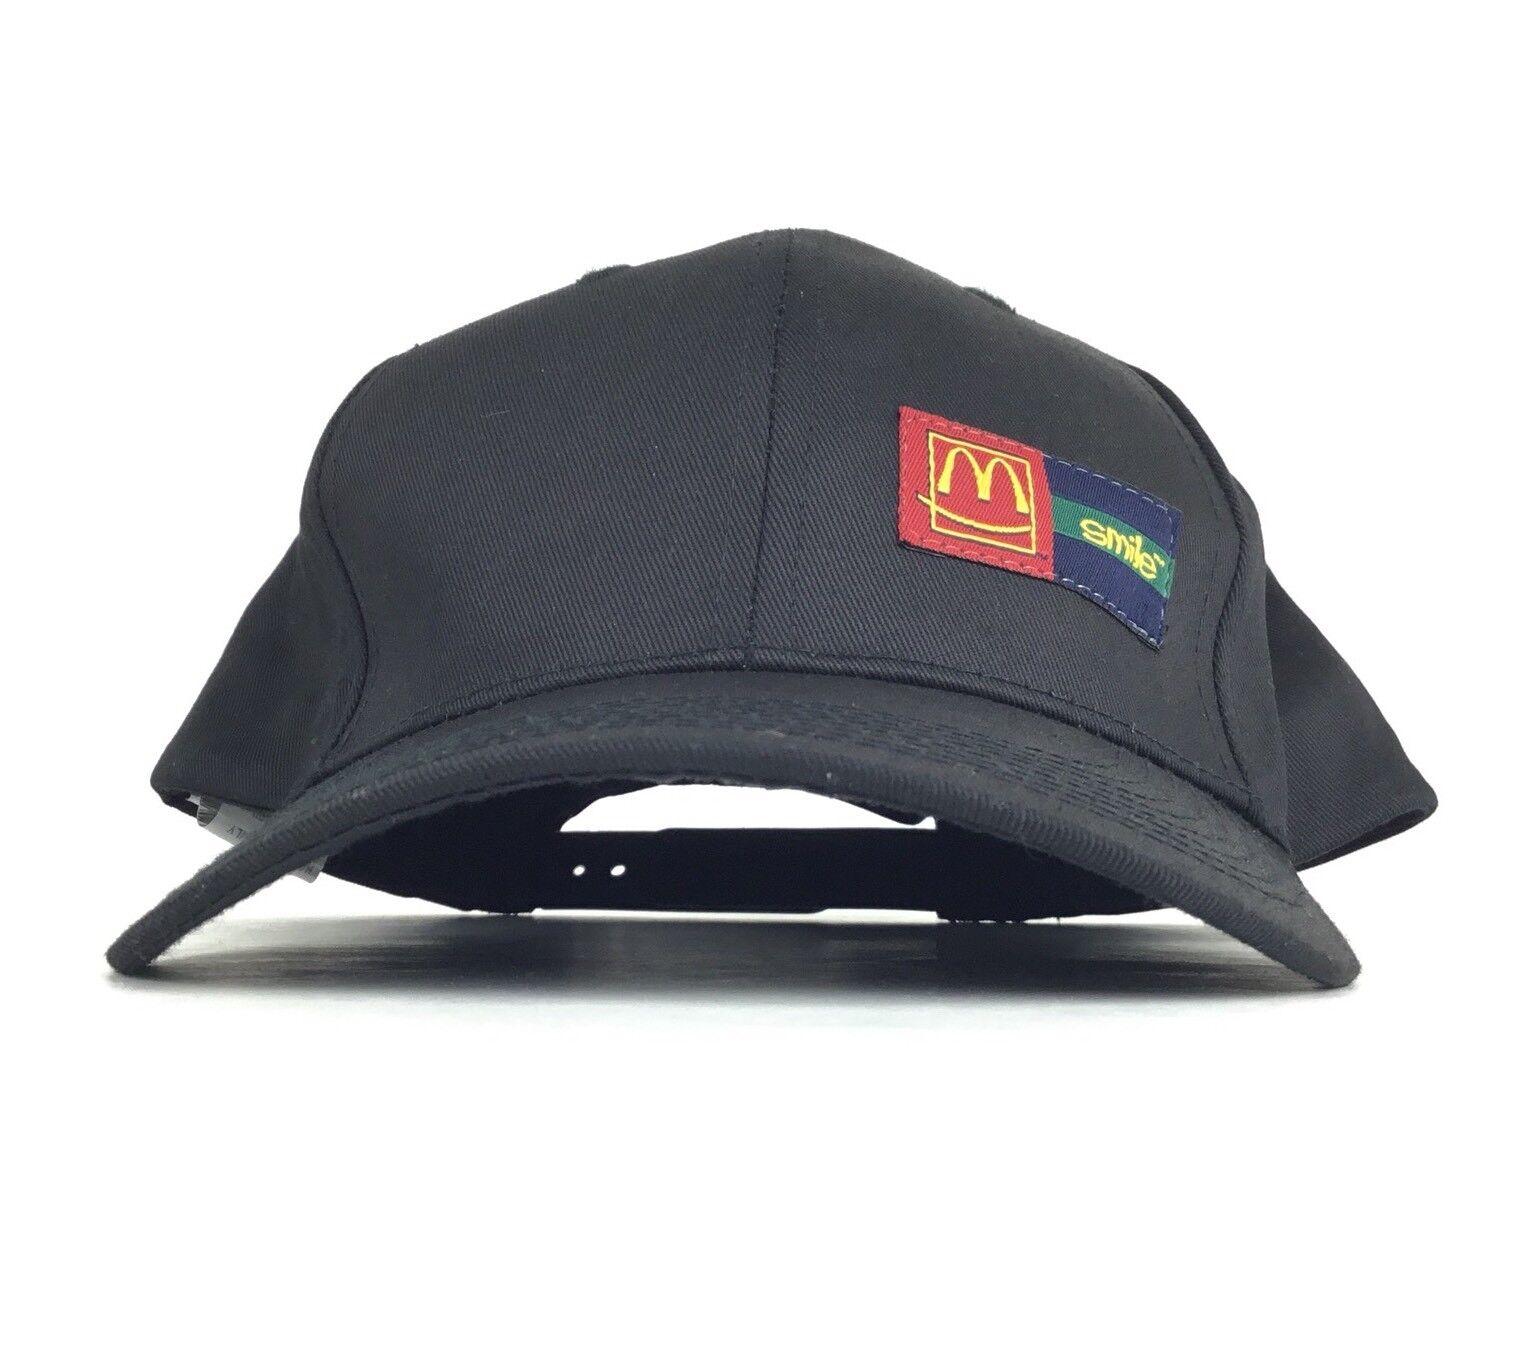 McDonalds Burger Restaurant Hat Smile Golden Arches Logo Baseball Cap Hat Restaurant Adj Adult 8a77c1